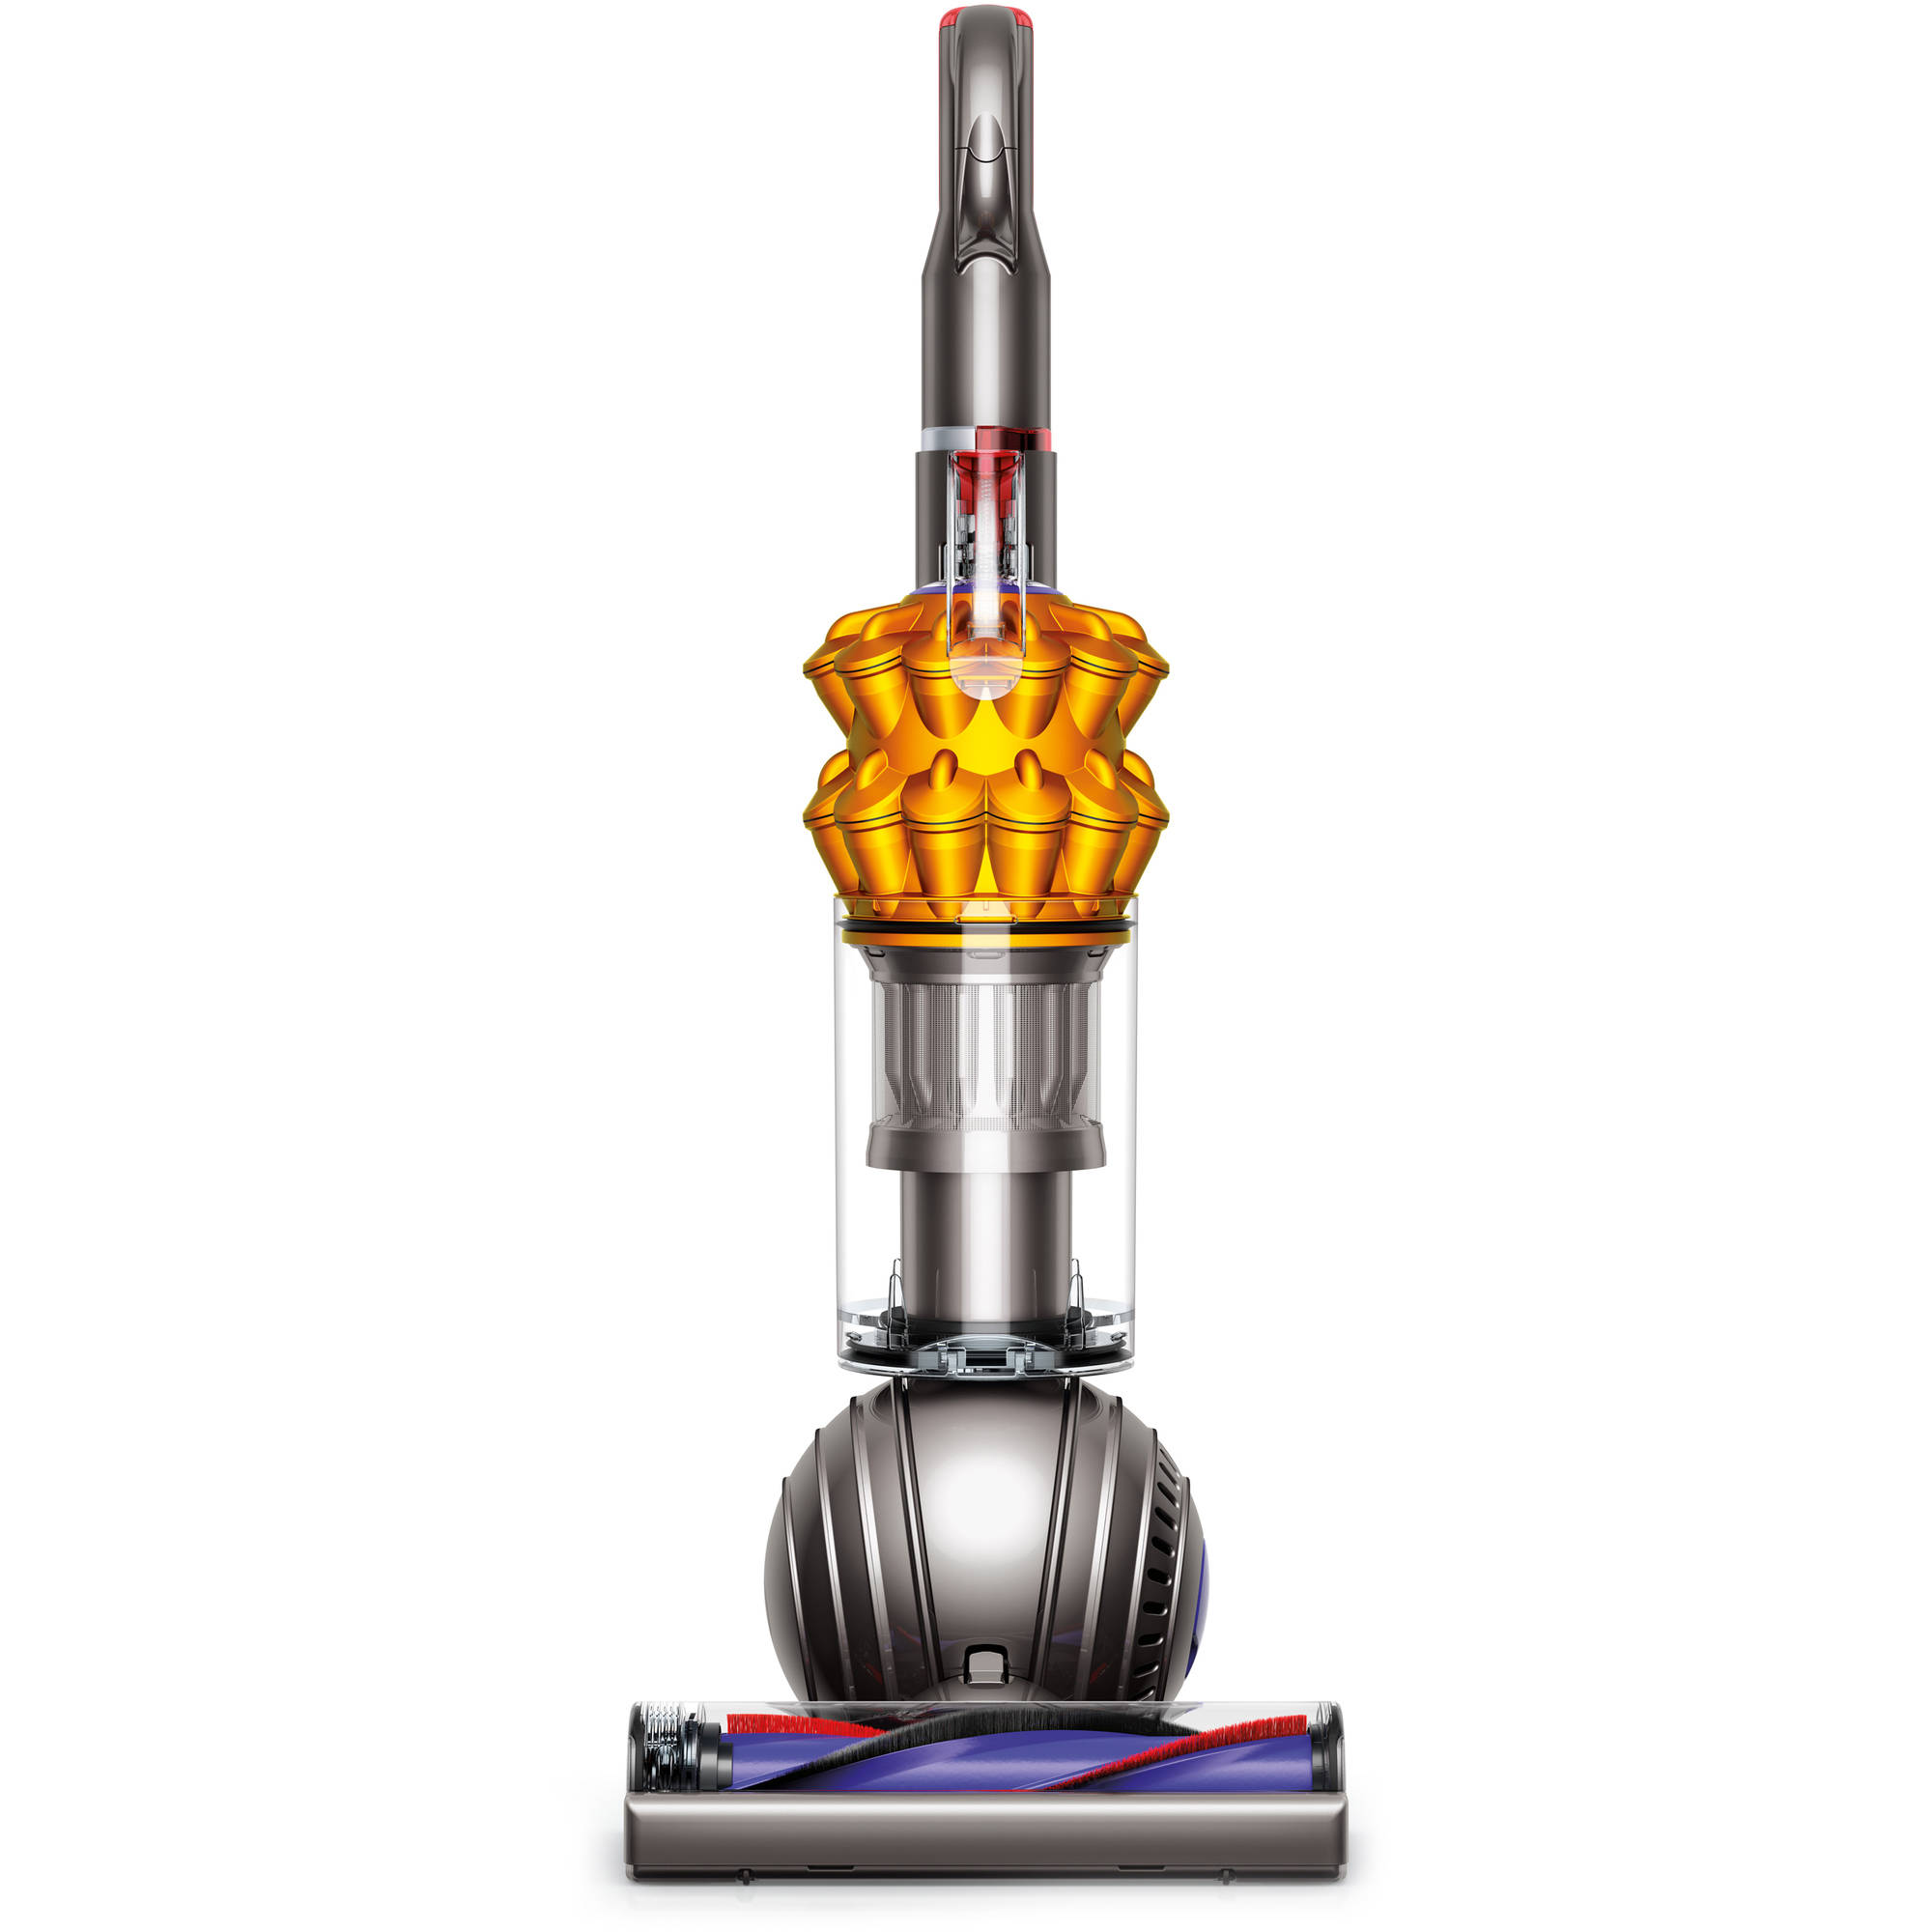 Dyson DC50 Multifloor Vacuum With Tools, 204253 01   Walmart.com